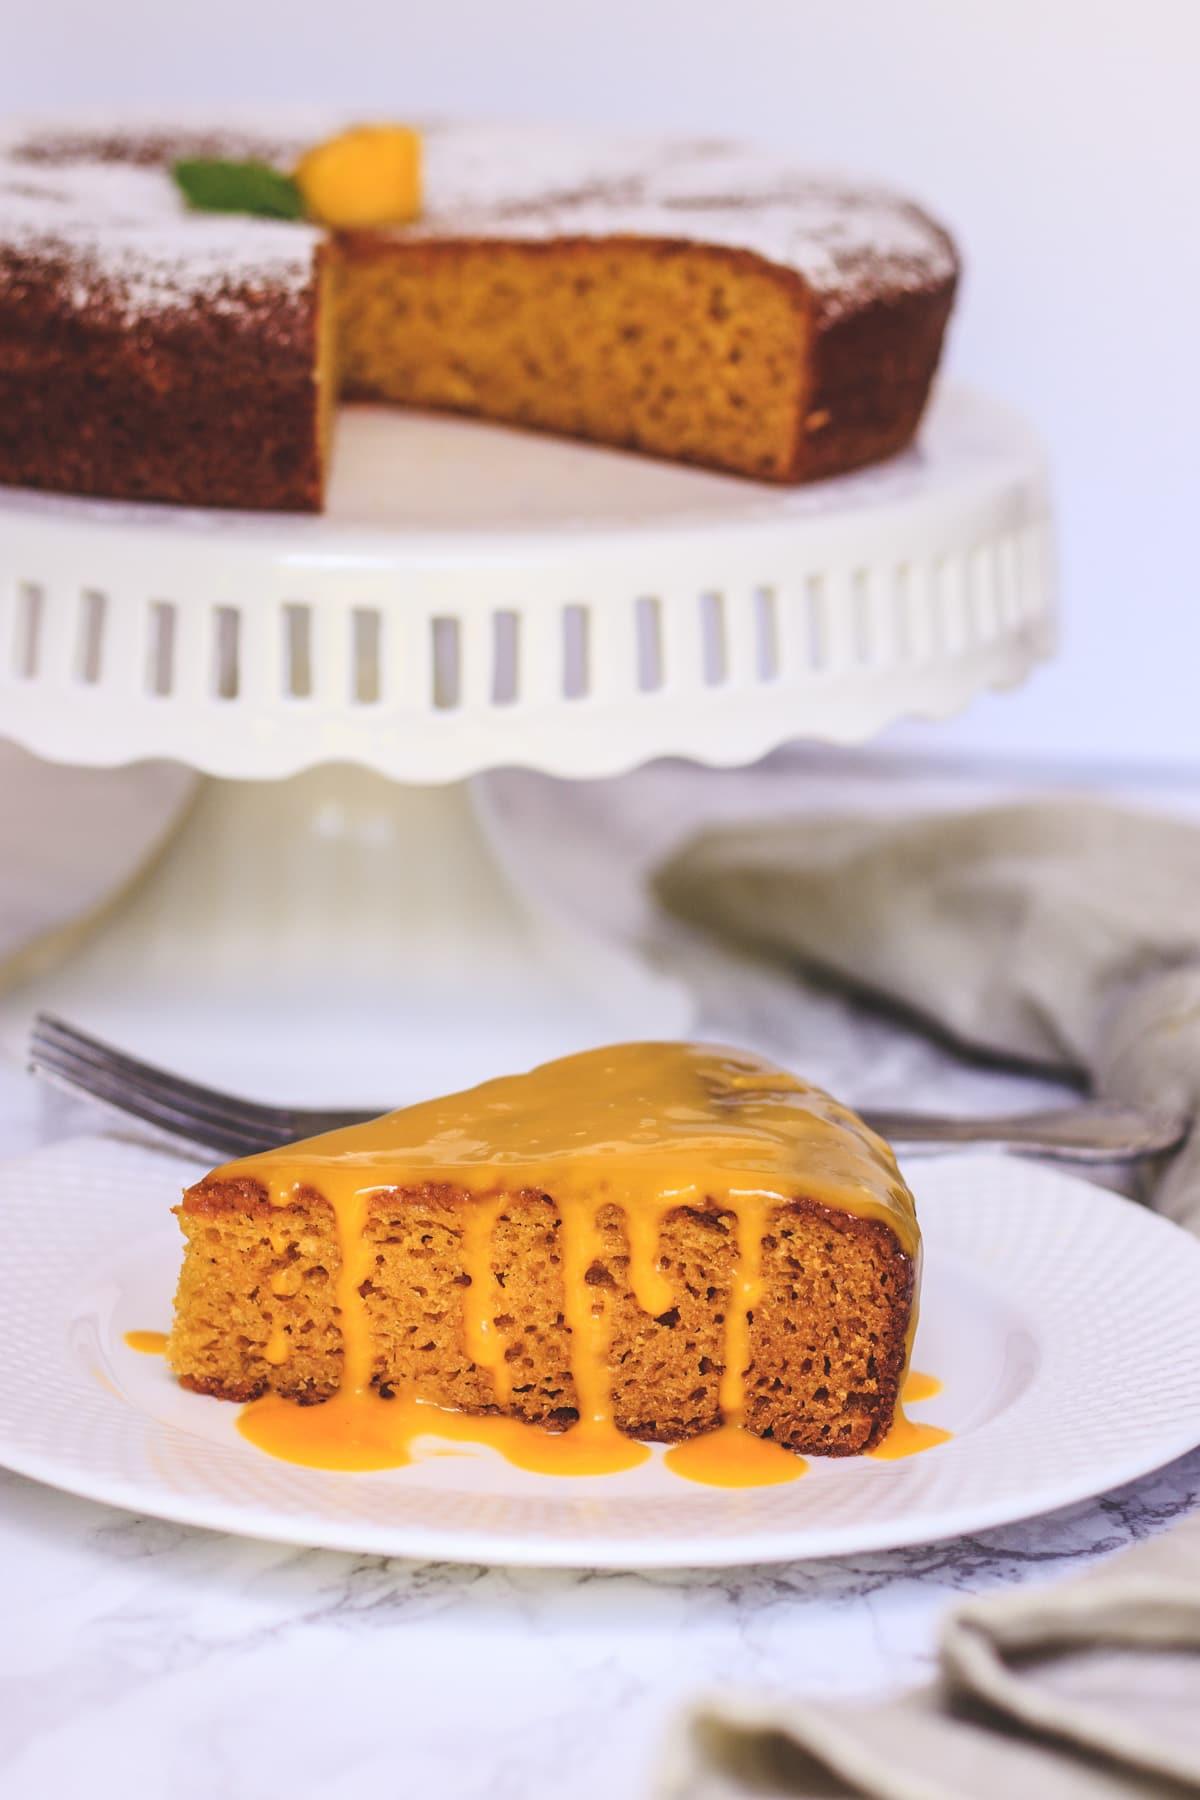 Slice of eggless mango cake with drizzle of mango sauce